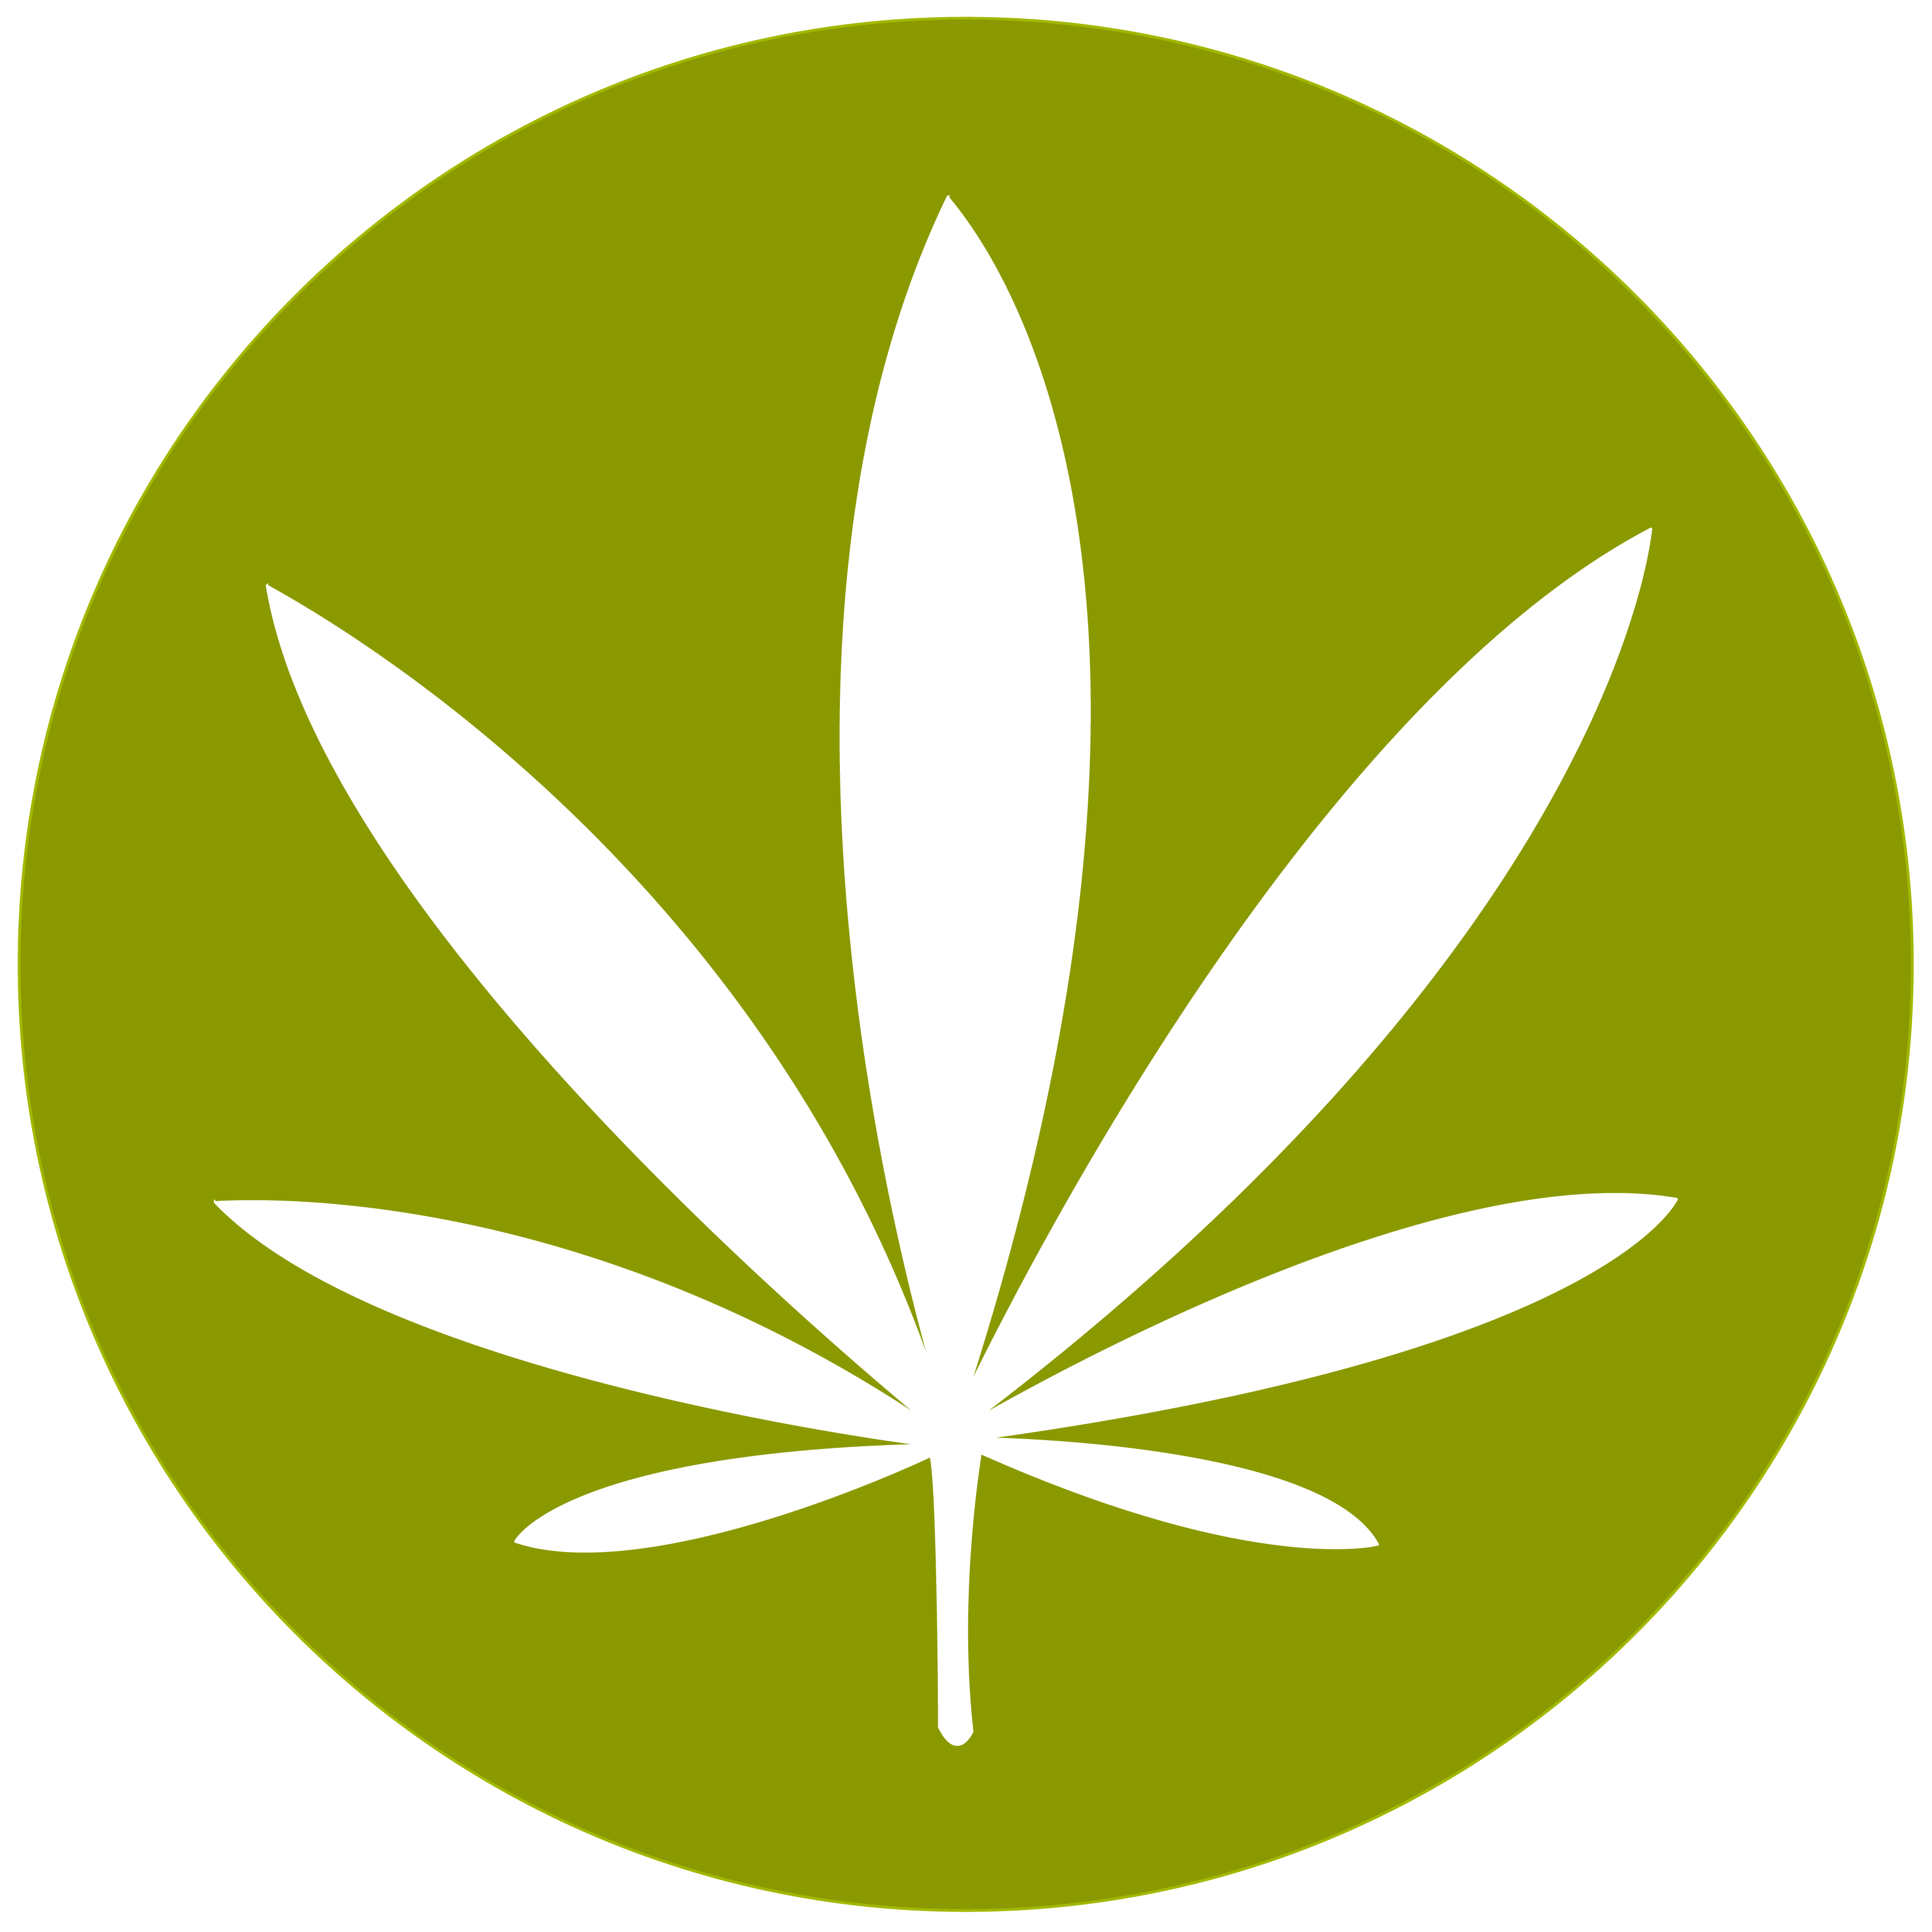 Marijuana leaf circle free clipart image-Marijuana leaf circle free clipart images-13